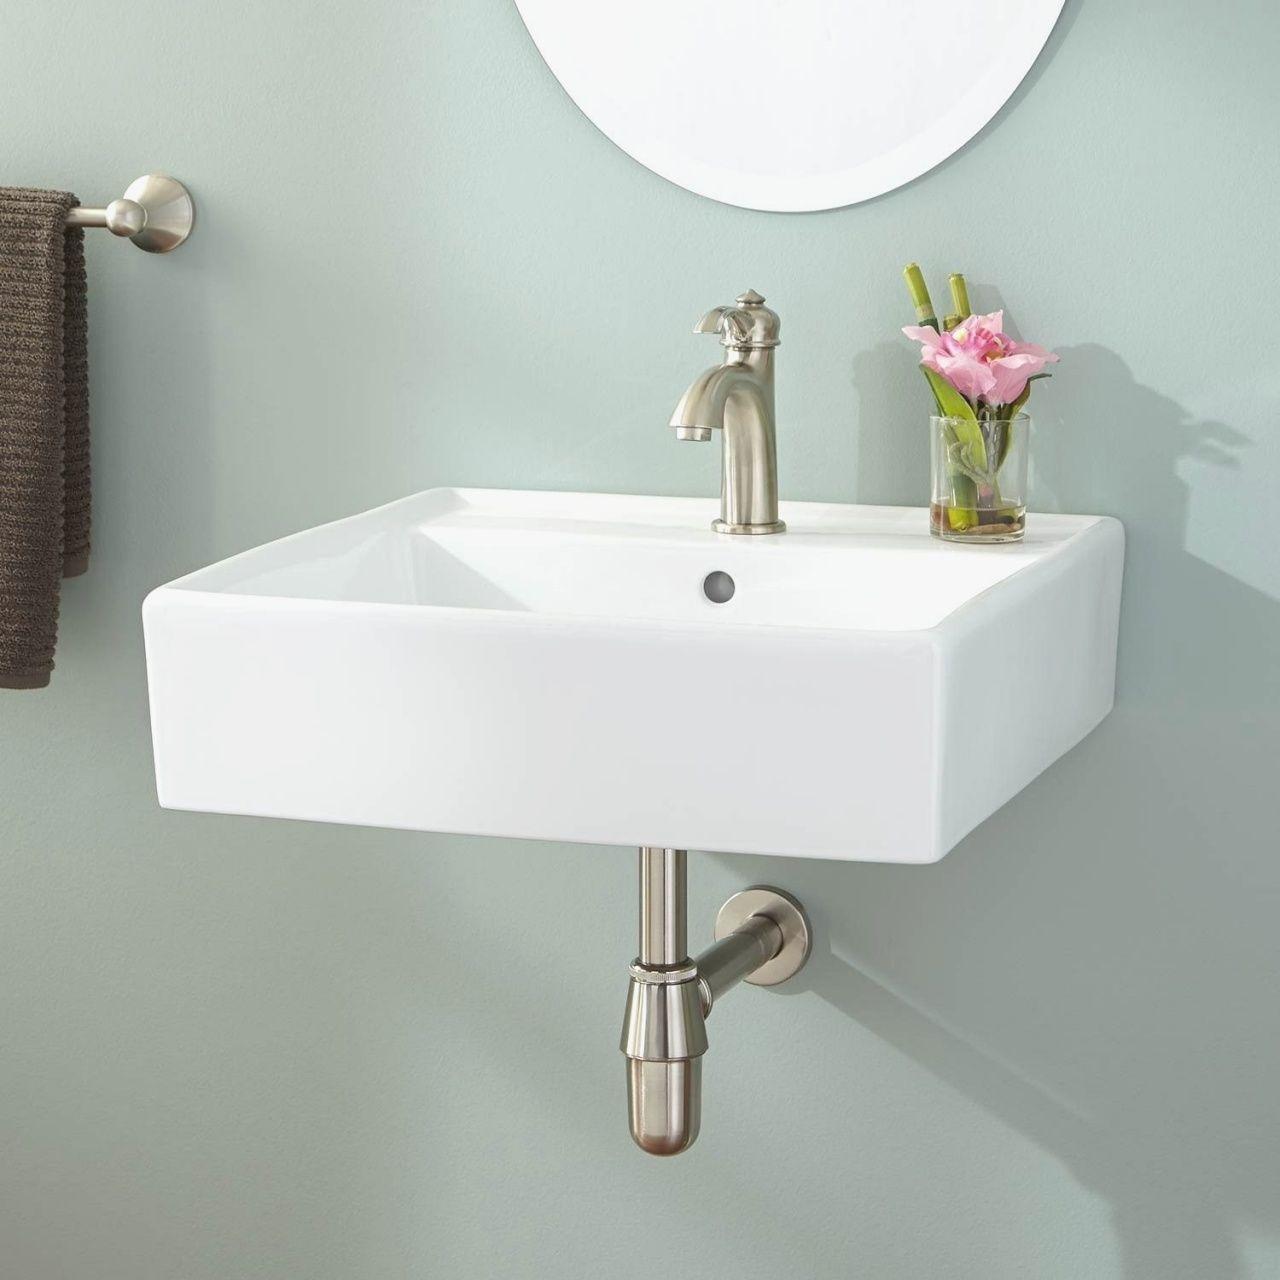 Wall Hung Lavatory Sinks In 2020 Small Bathroom Sinks Wall